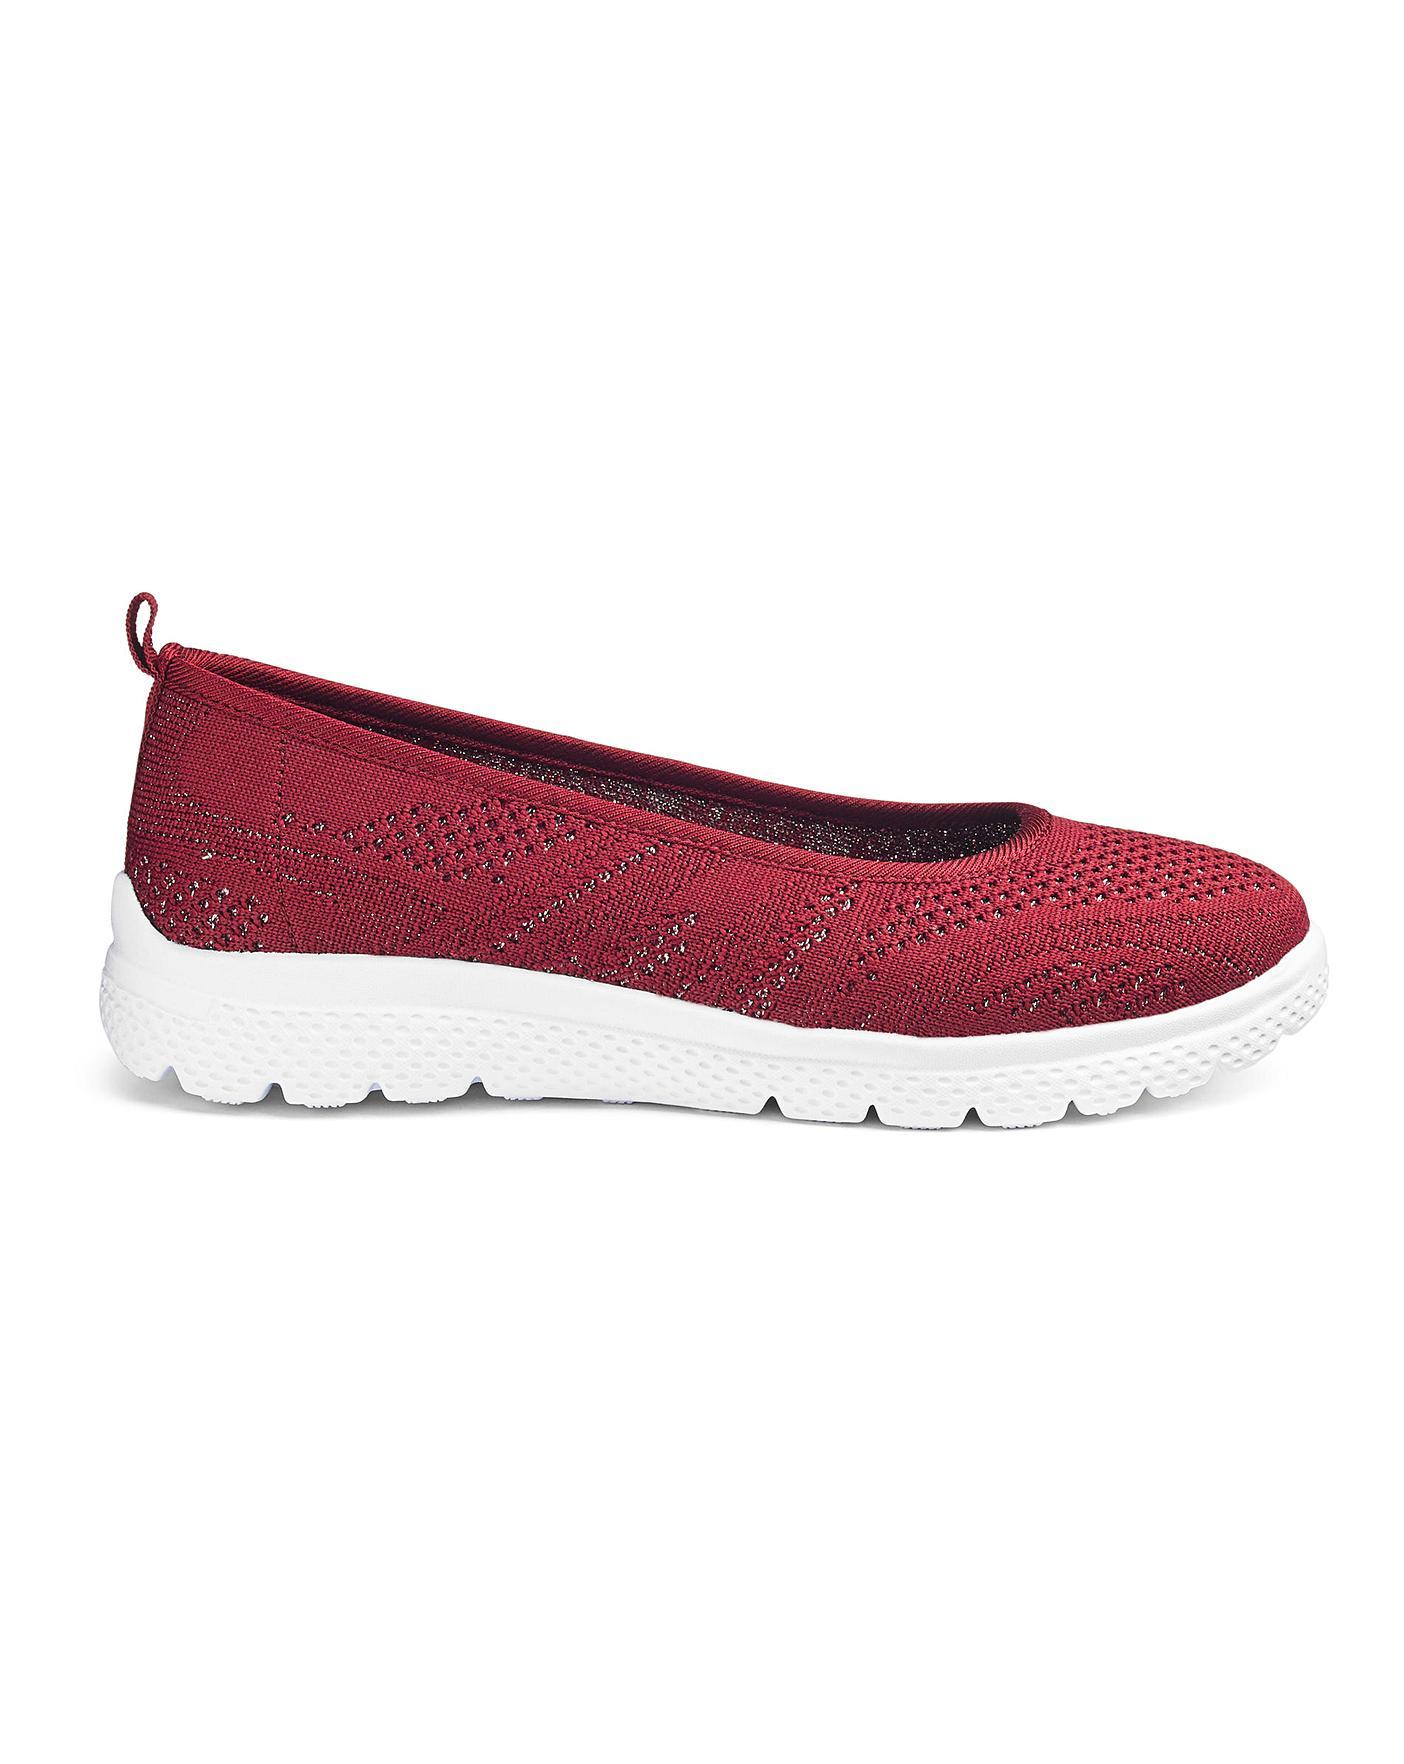 Cushion Walk Leisure Shoes EEE Fit | J